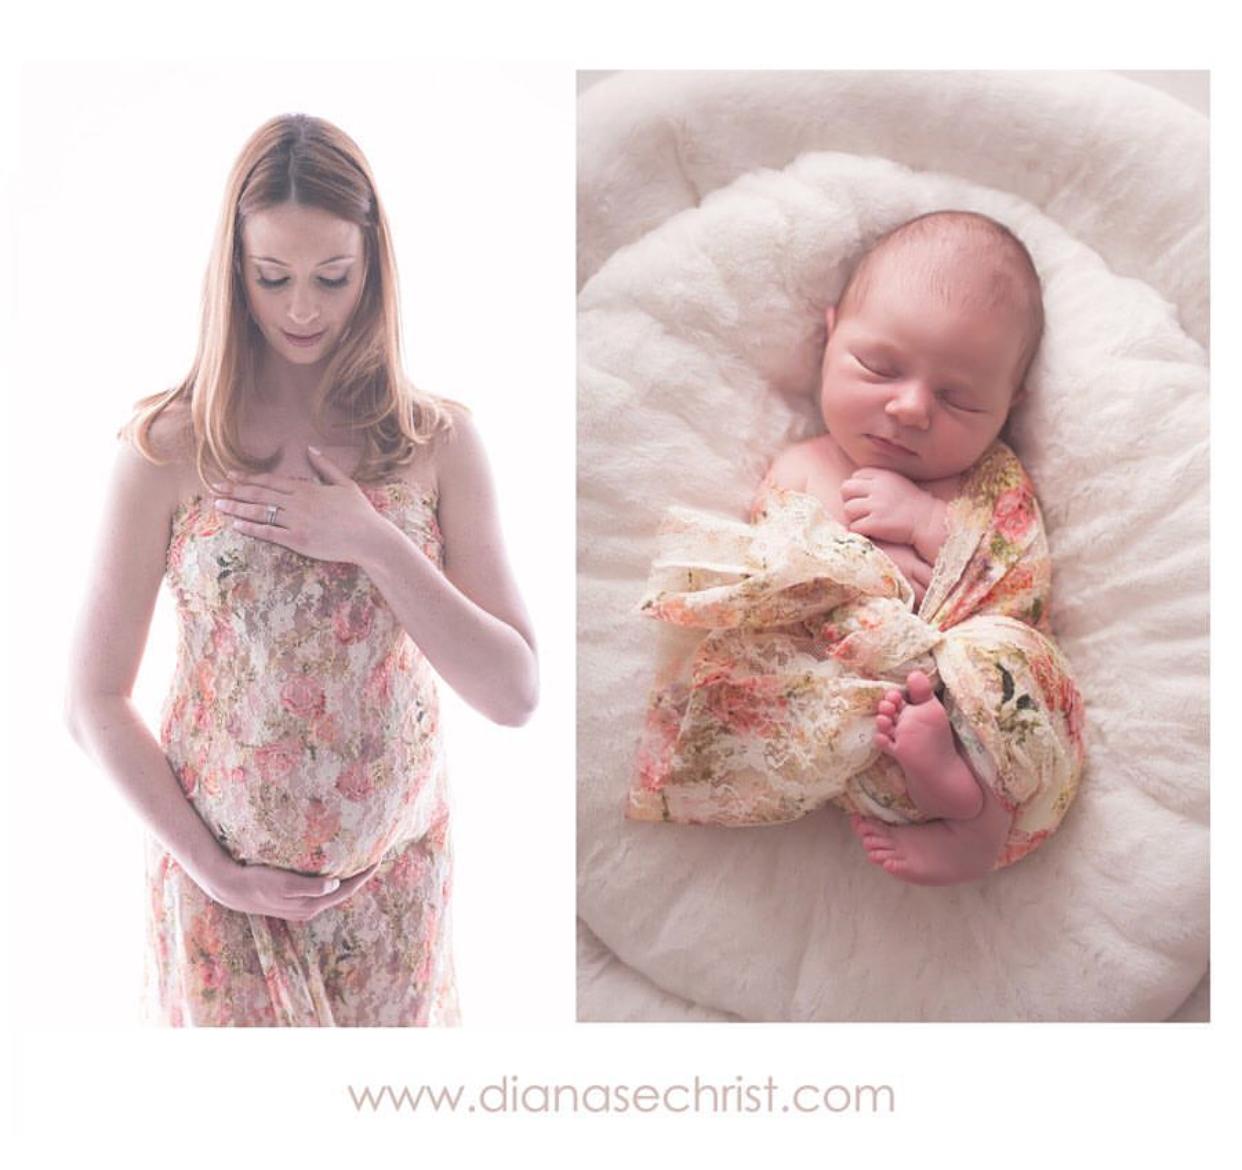 boston_pregnancy_photographer02.jpeg